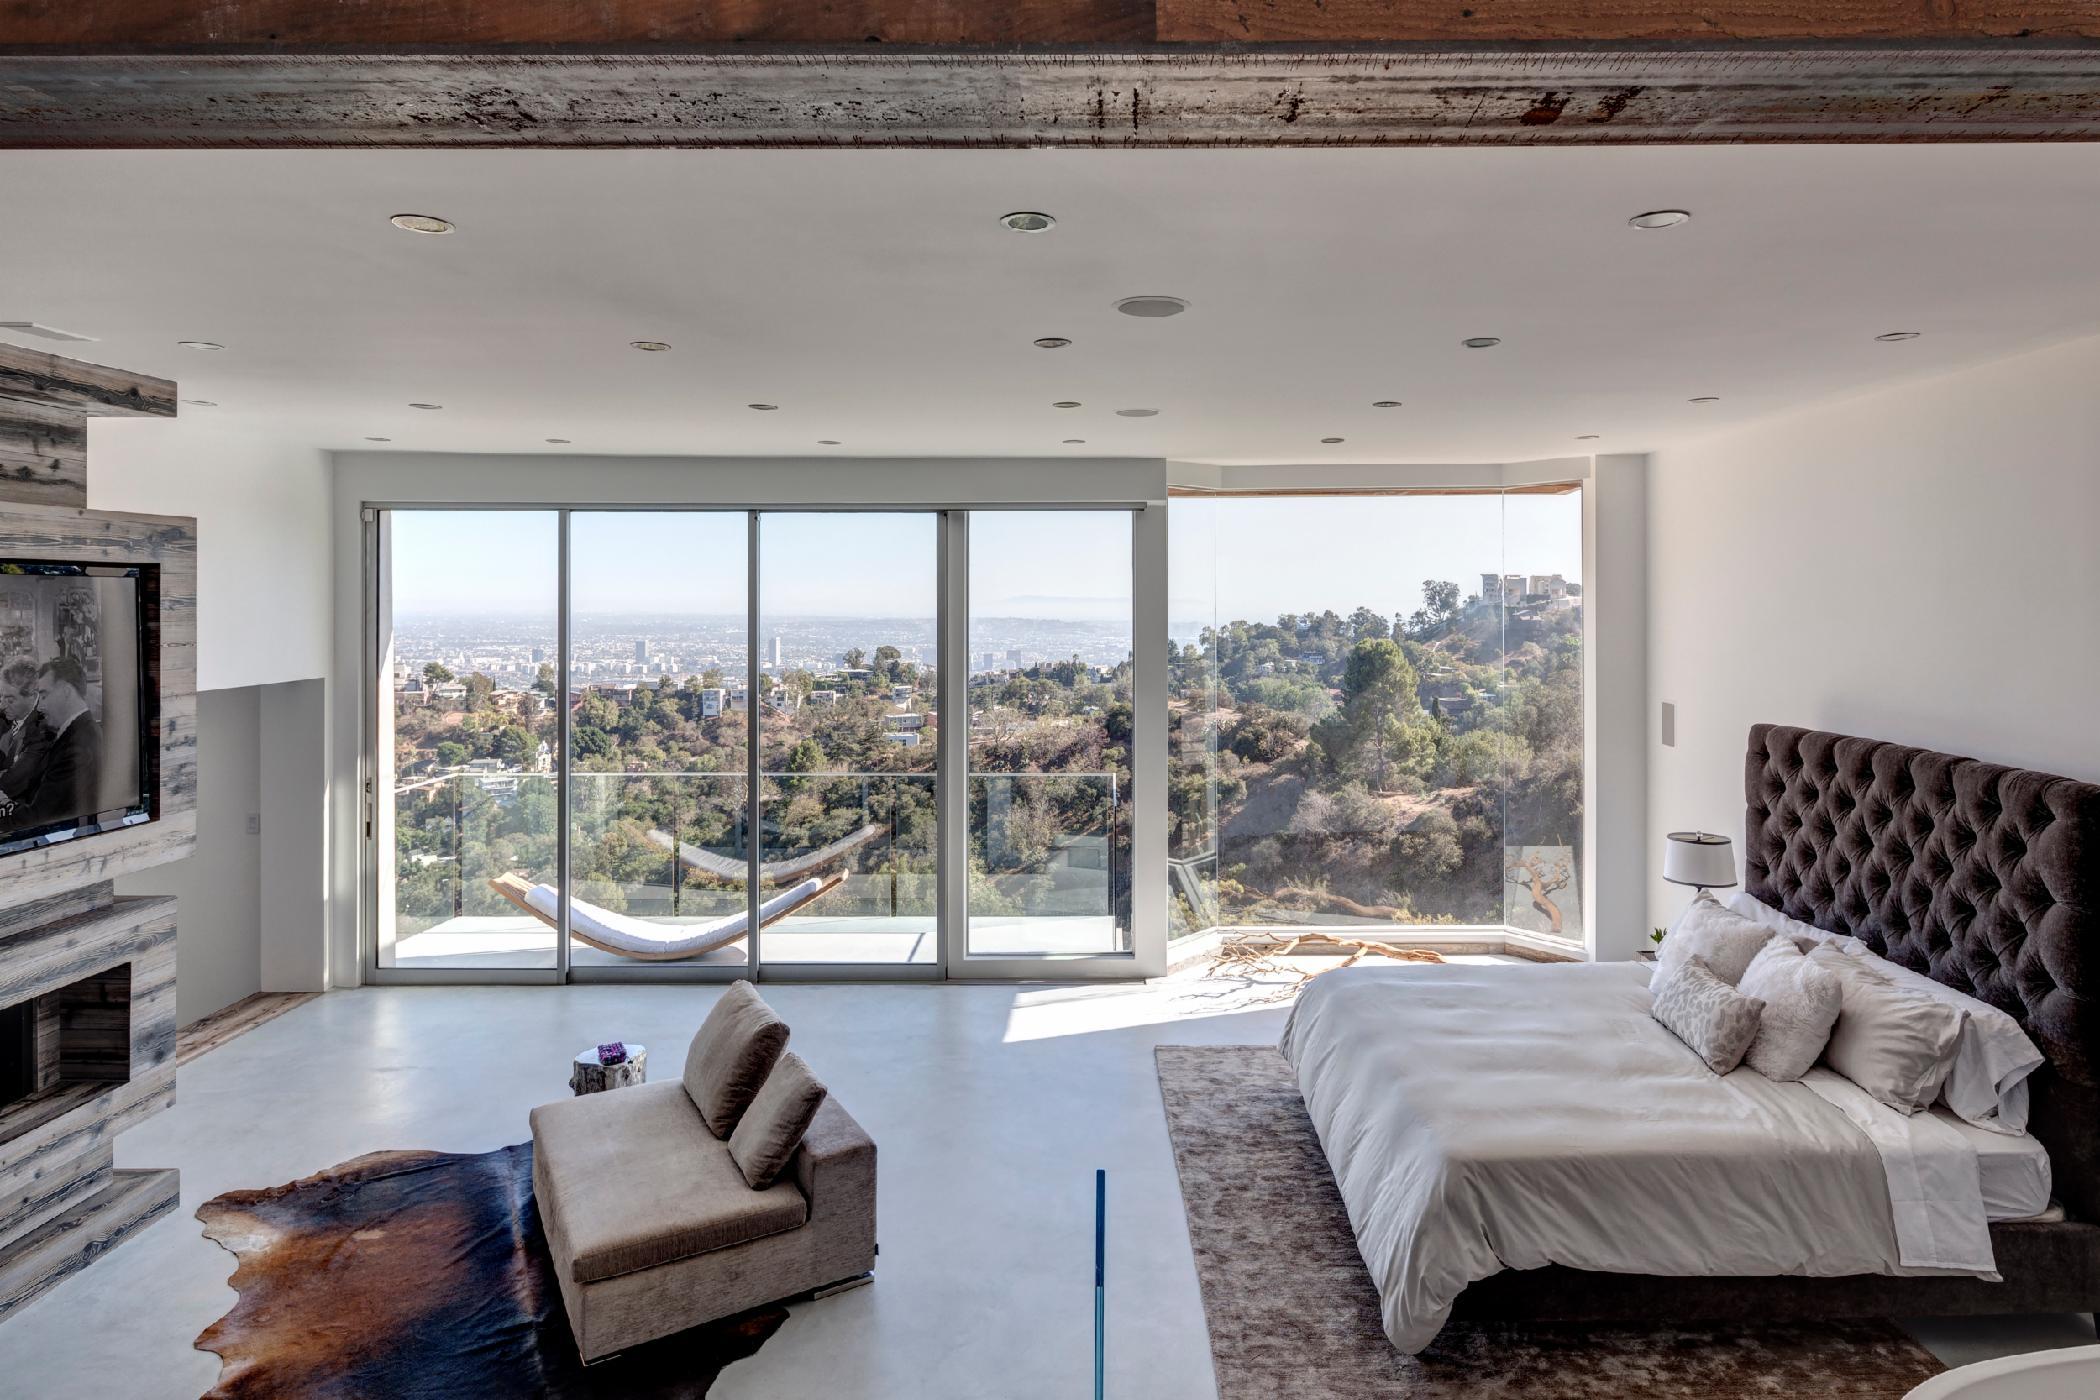 Ultramodern Rustic West Hollywood Vista